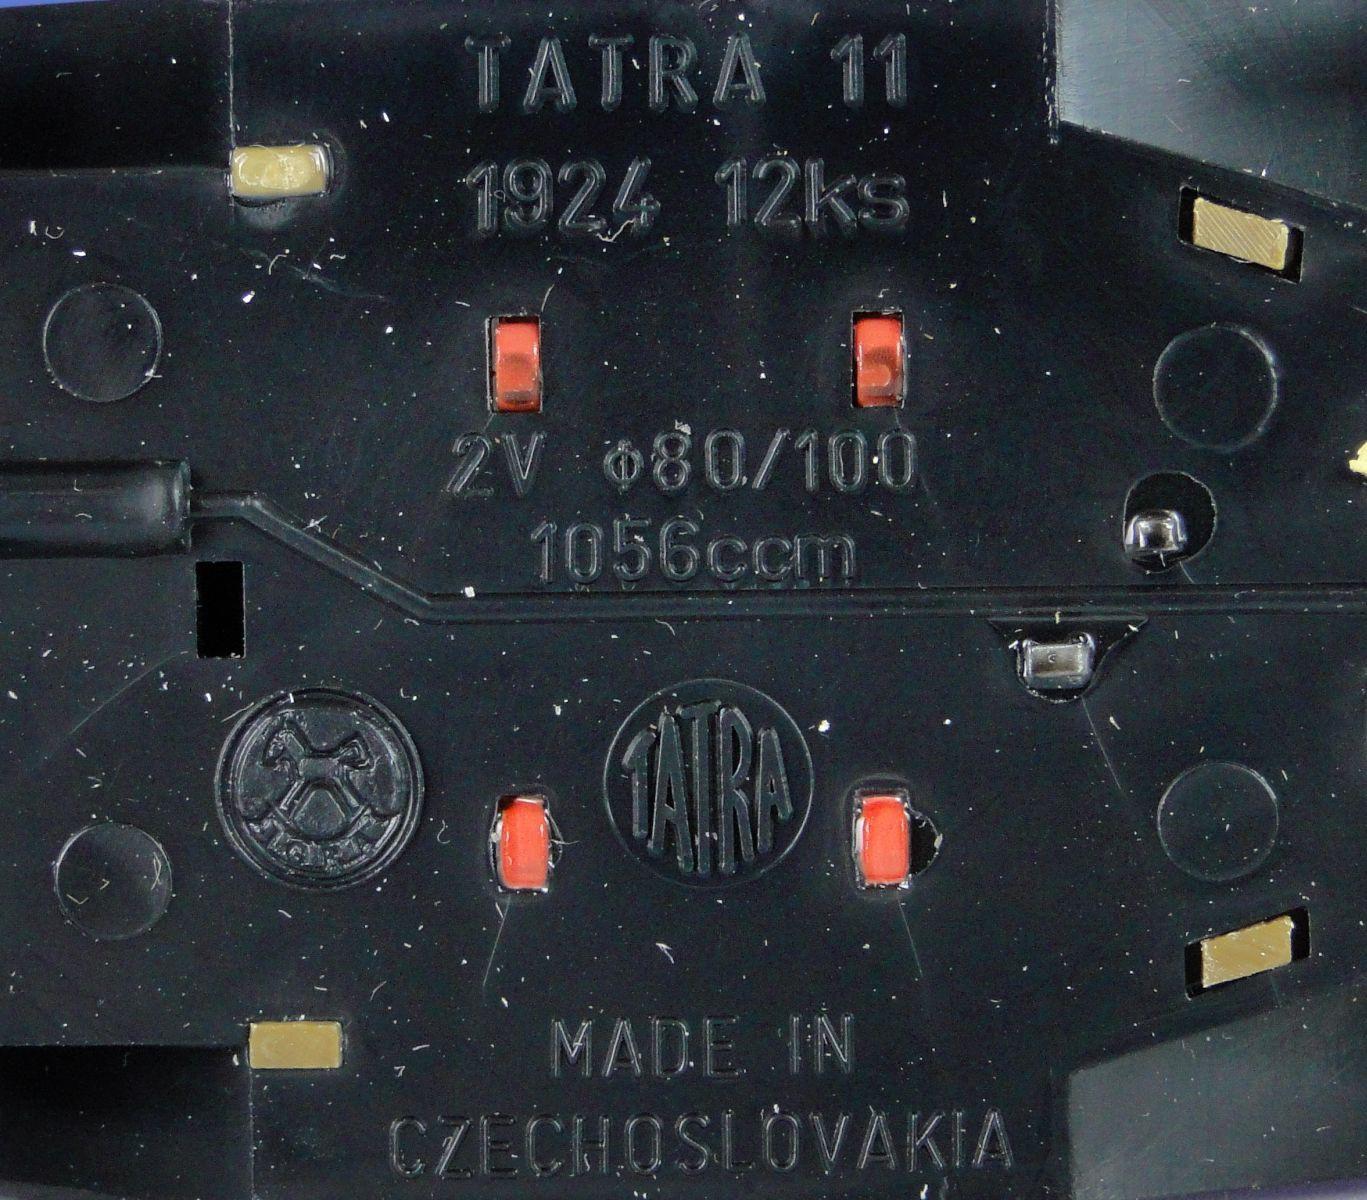 DSC06019.JPG (1367×1200)